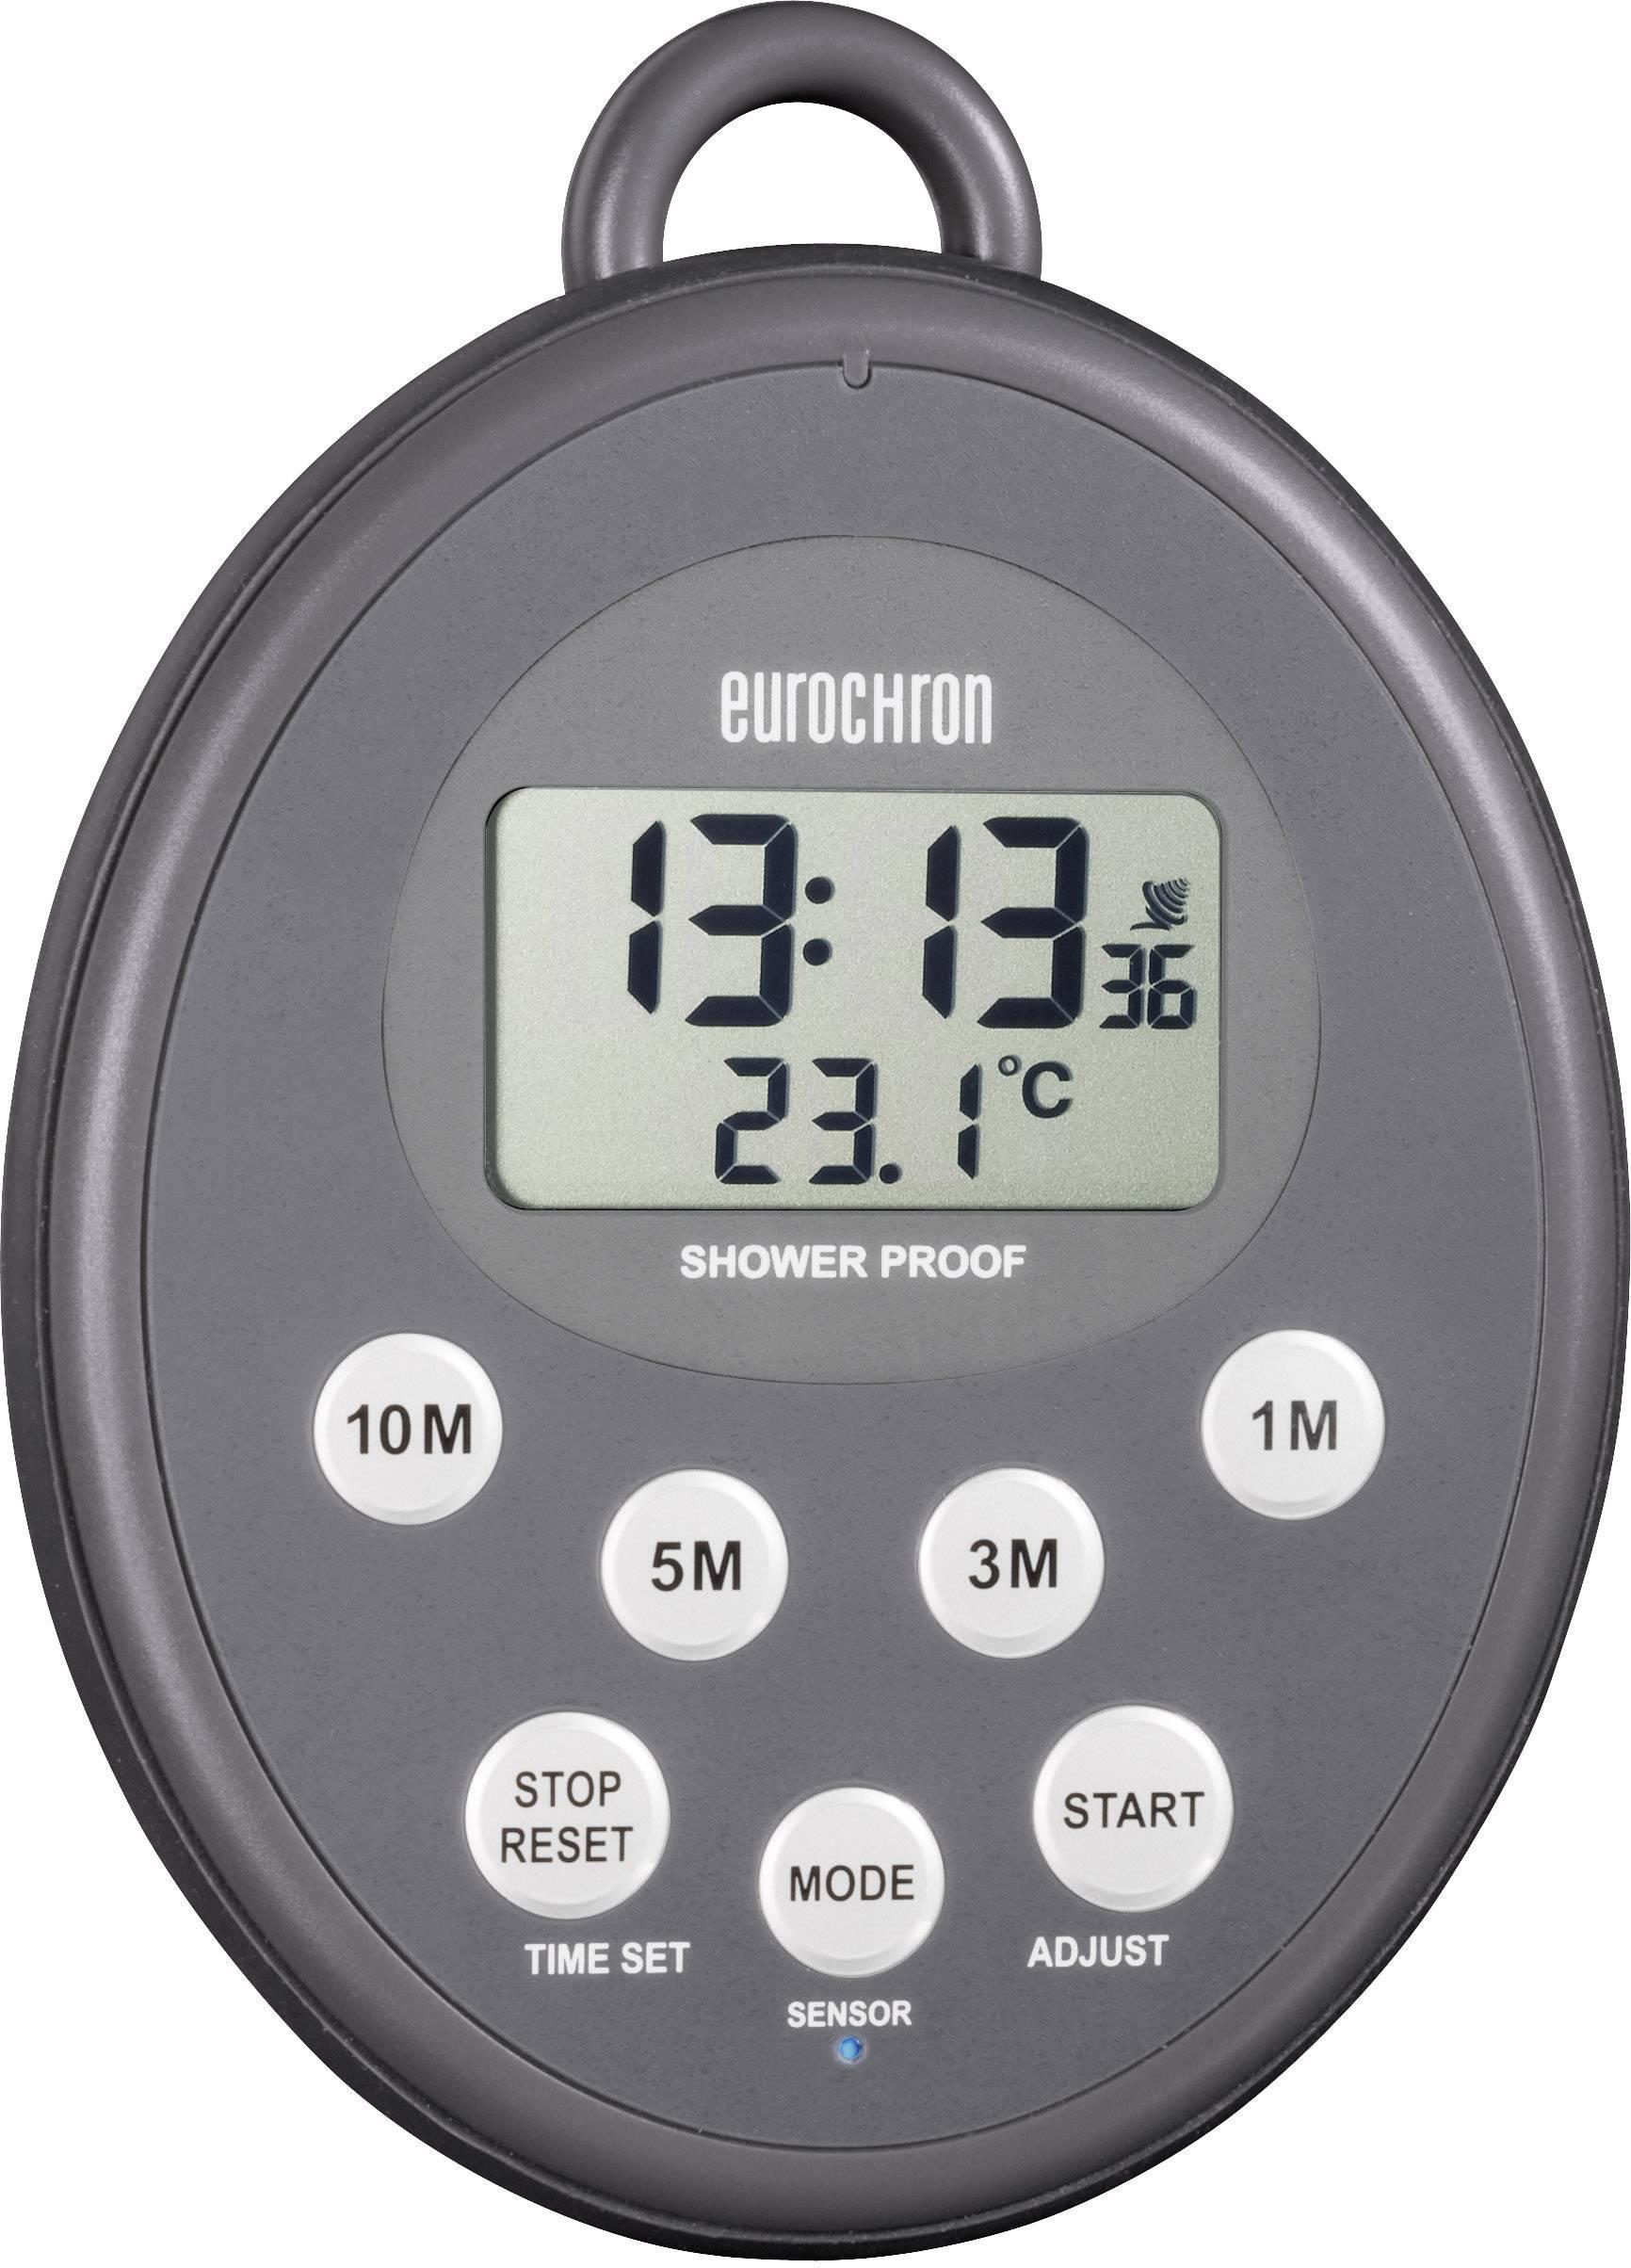 Digitálny časovač s DCF hodinami Eurochron EDT 3000, IPX 7